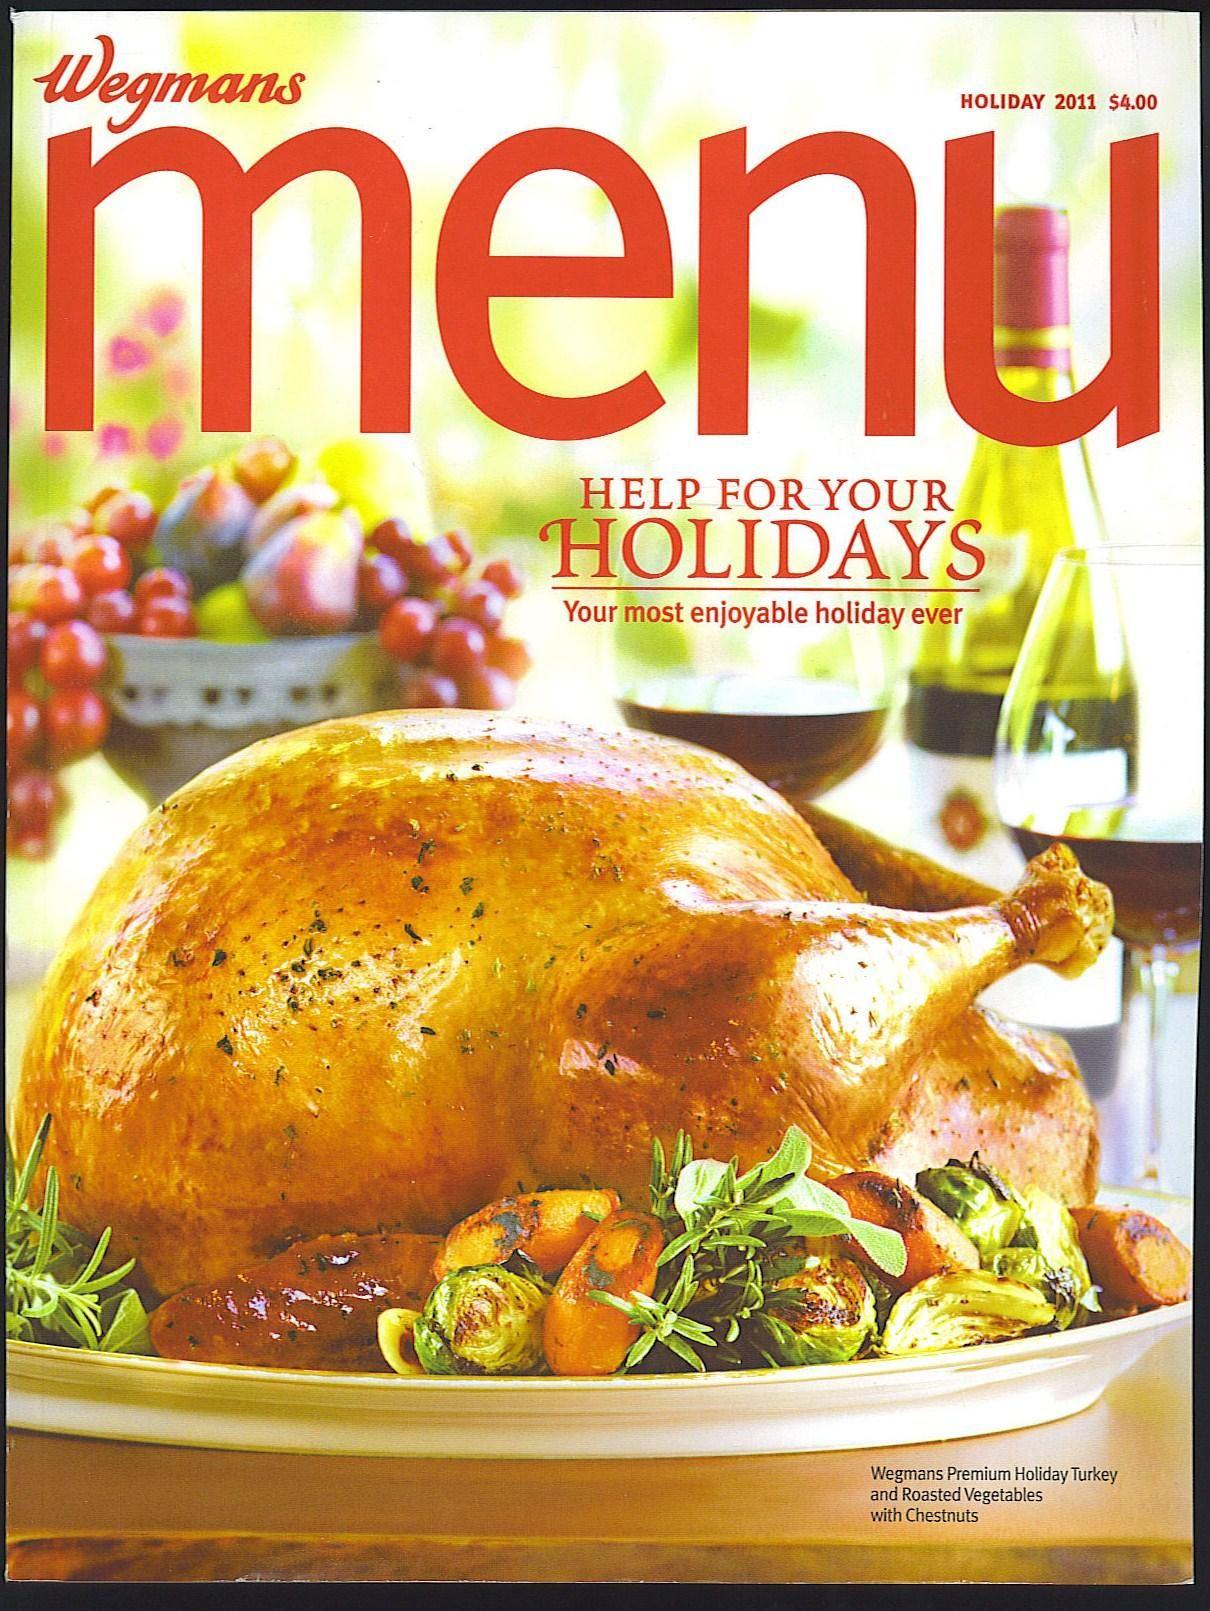 Wegmans Thanksgiving Turkey  wegmans holiday menu Google Search